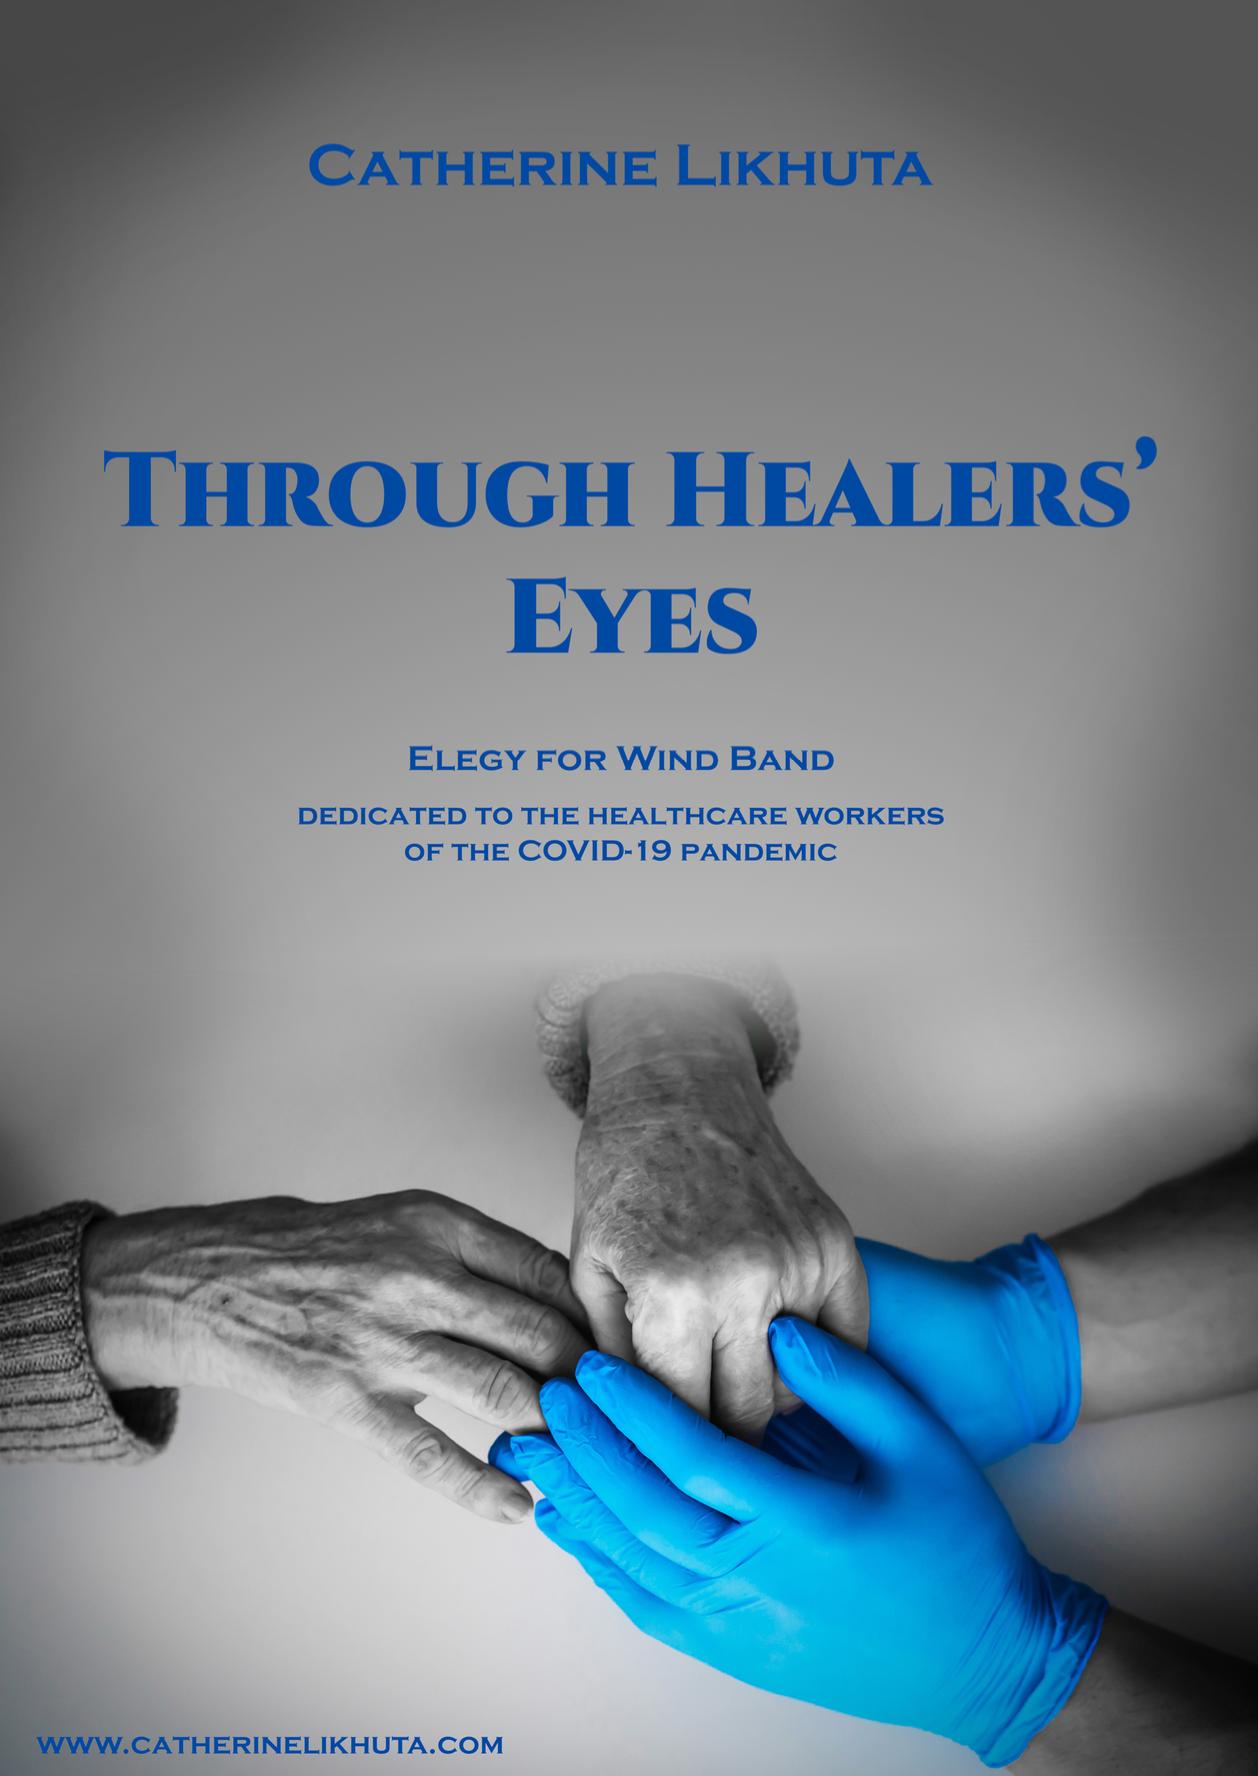 Through Healer's Eyes by Cathy Likhuta